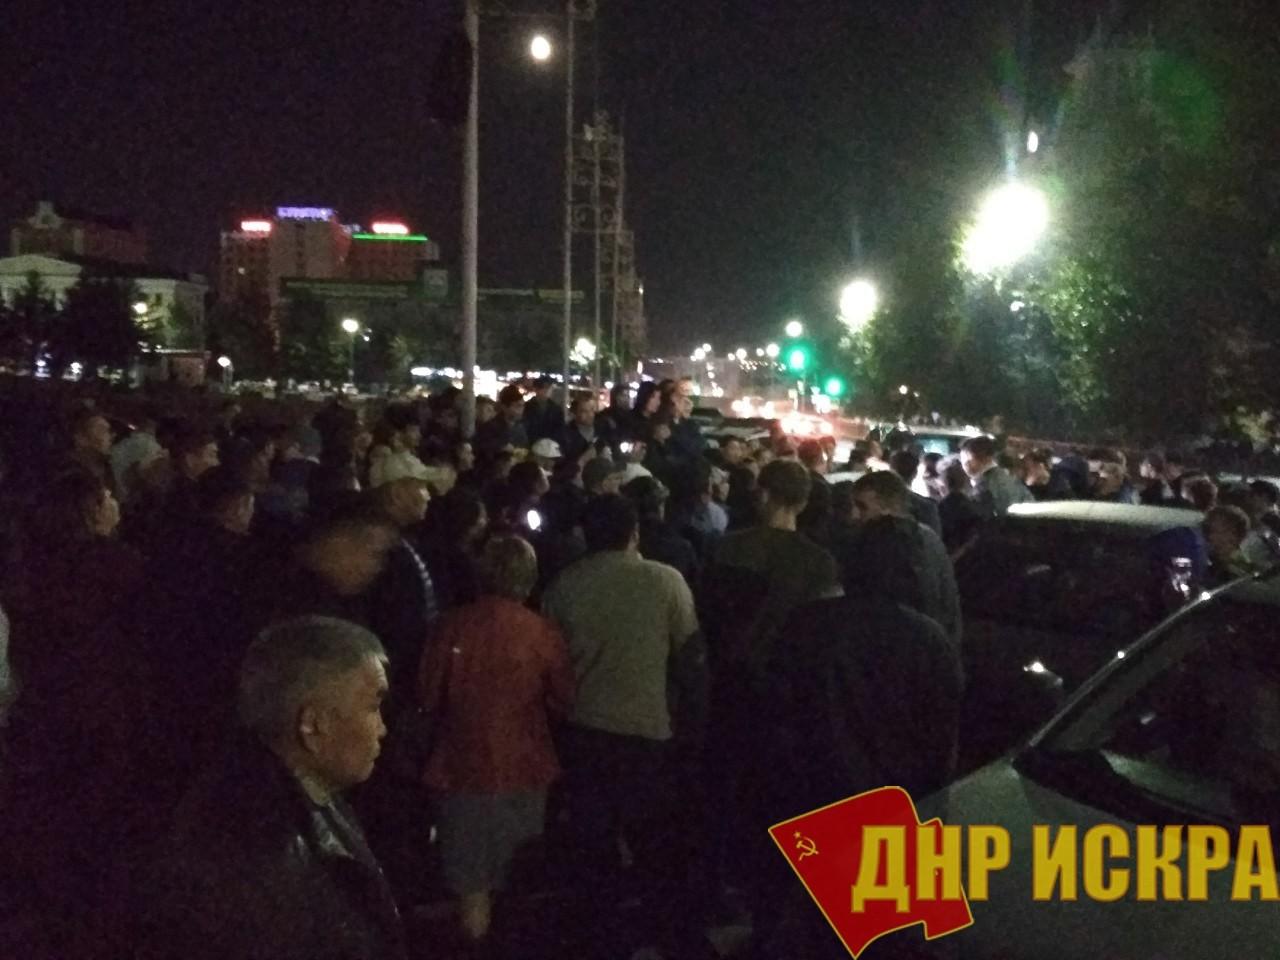 В Улан-Удэ задержан депутат-коммунист